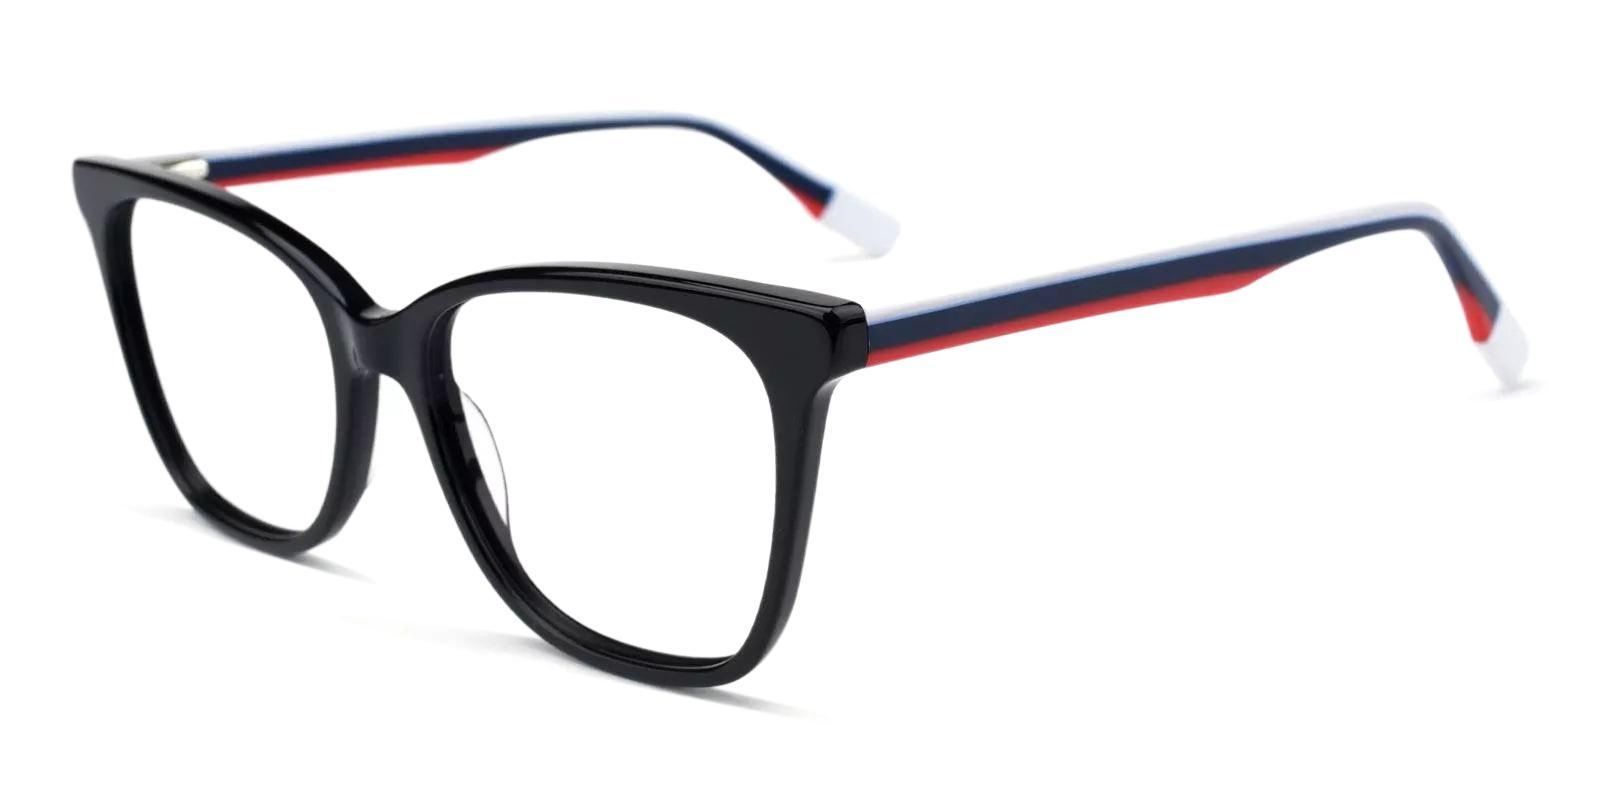 Pamela Black Acetate Eyeglasses , Fashion , SpringHinges , UniversalBridgeFit Frames from ABBE Glasses